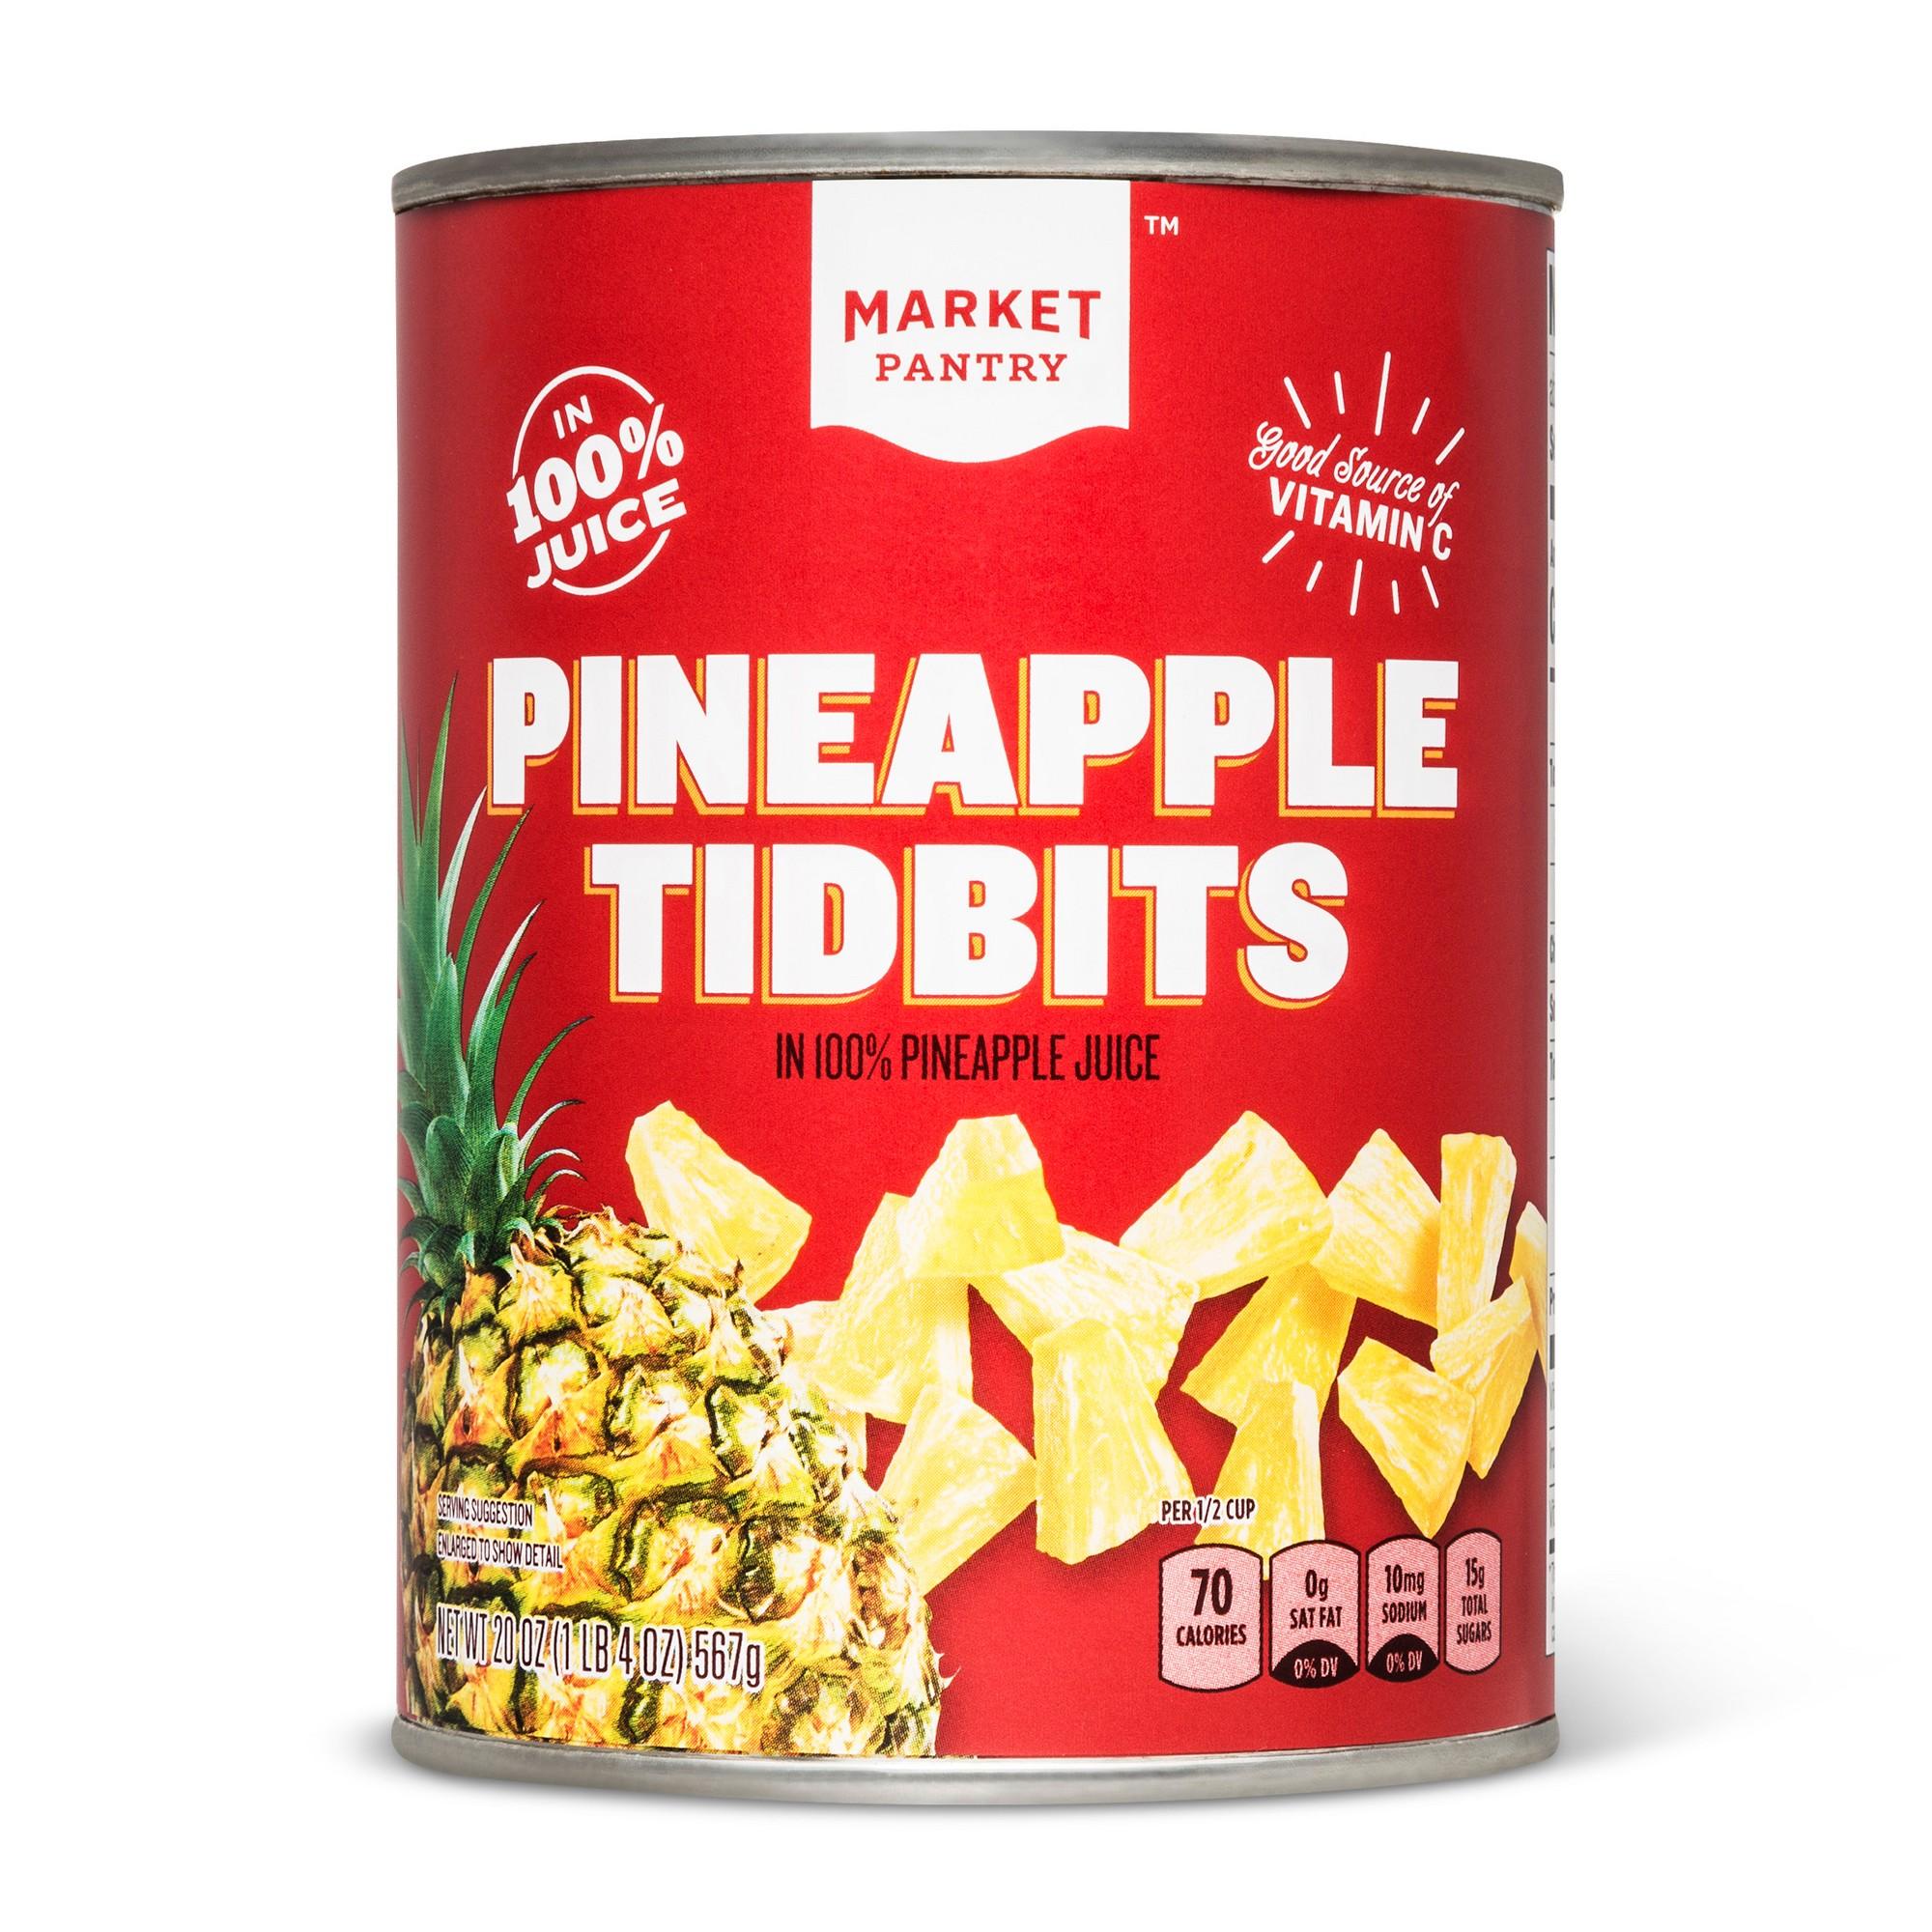 Pineapple Tidbits in 100% Pineapple Juice 20oz - Market Pantry